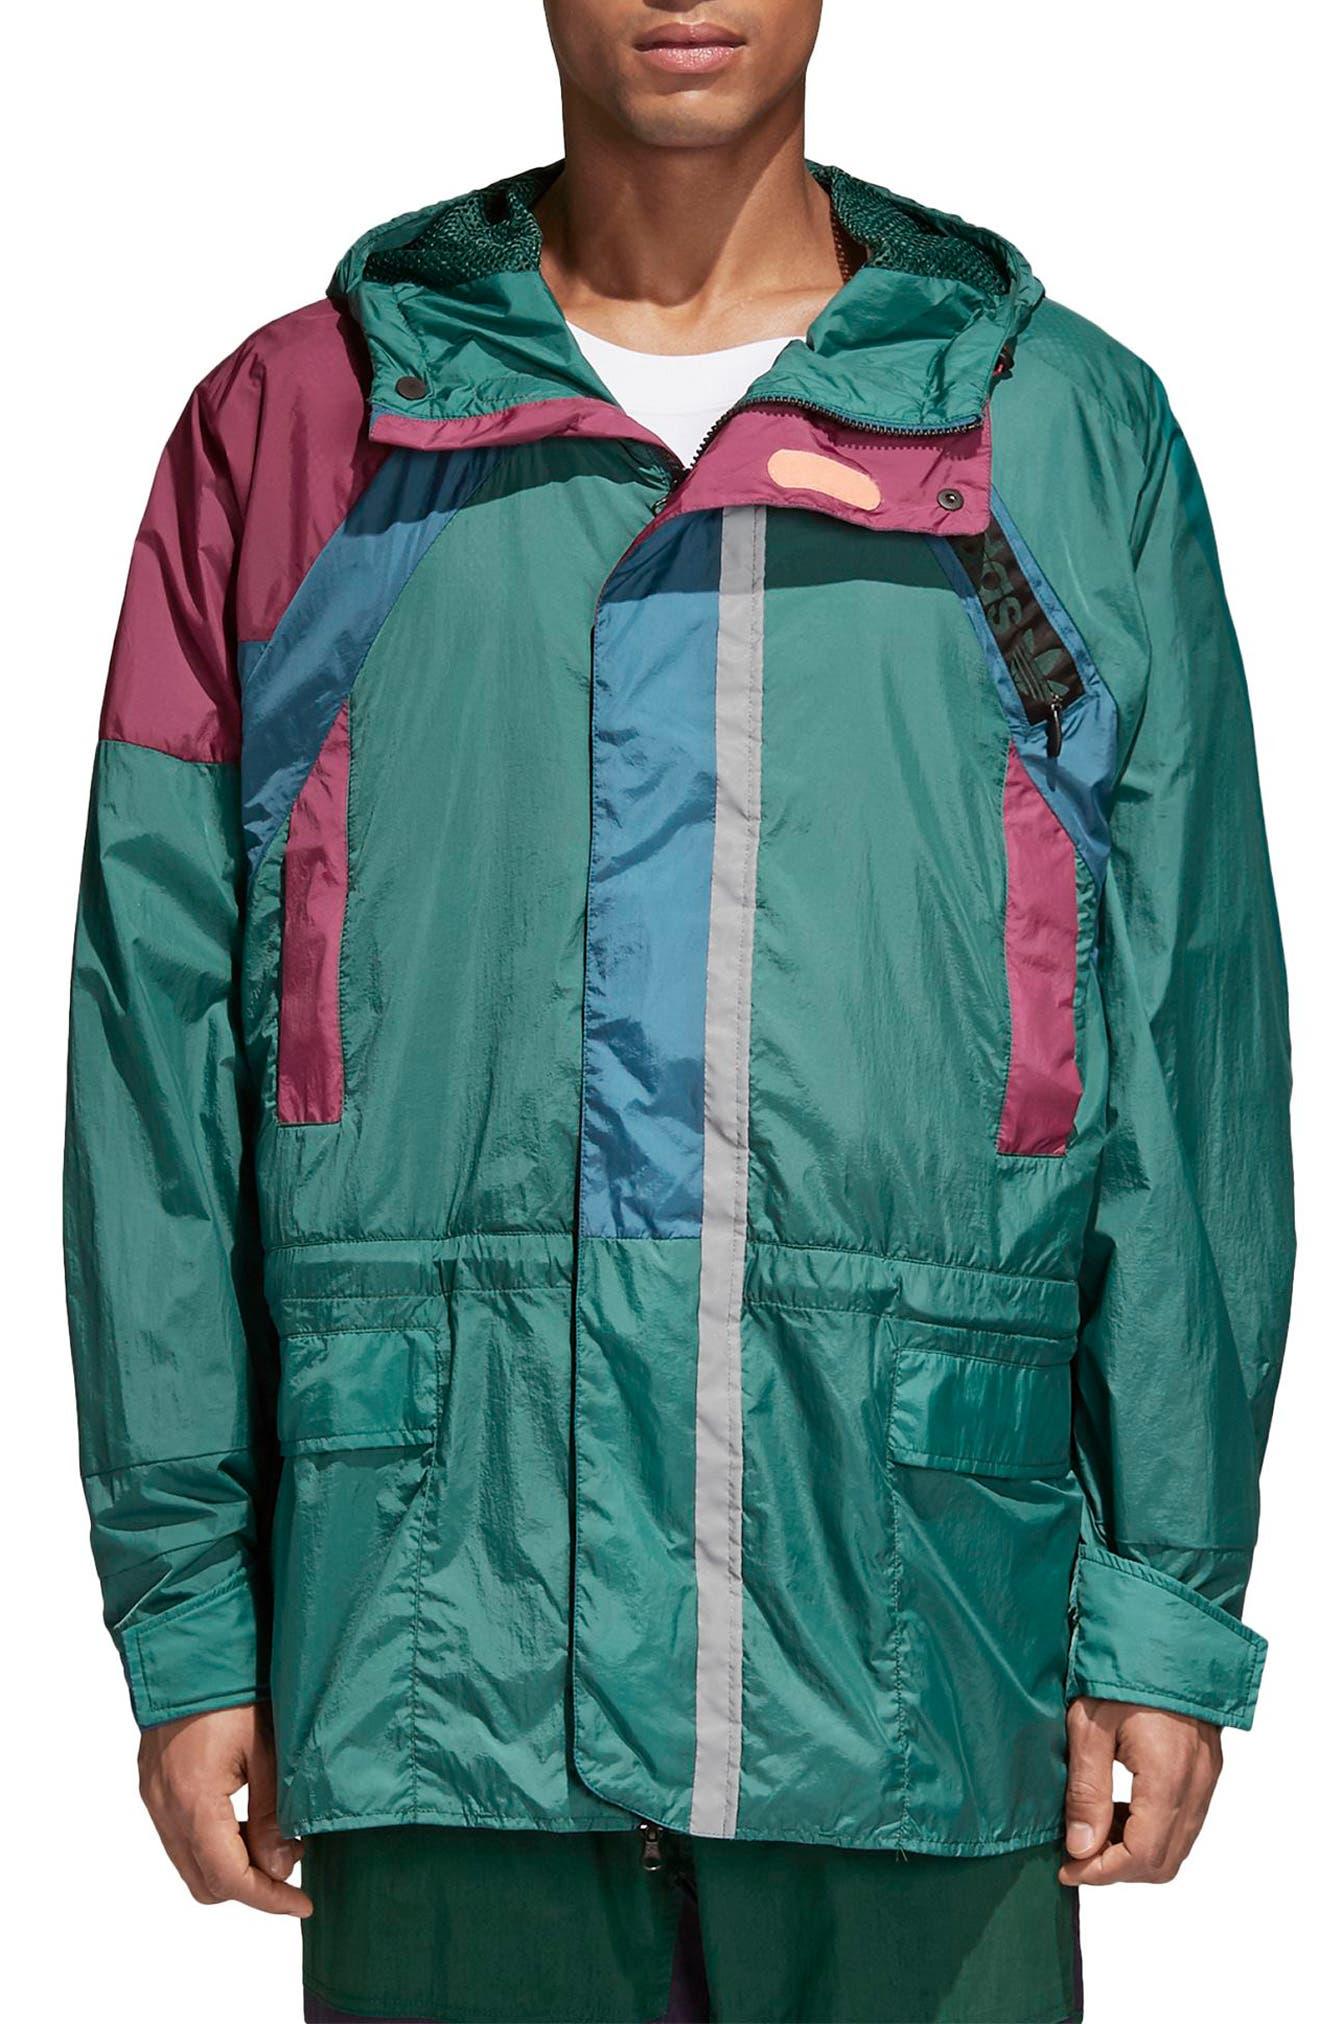 Vintage Jacket,                             Main thumbnail 1, color,                             305